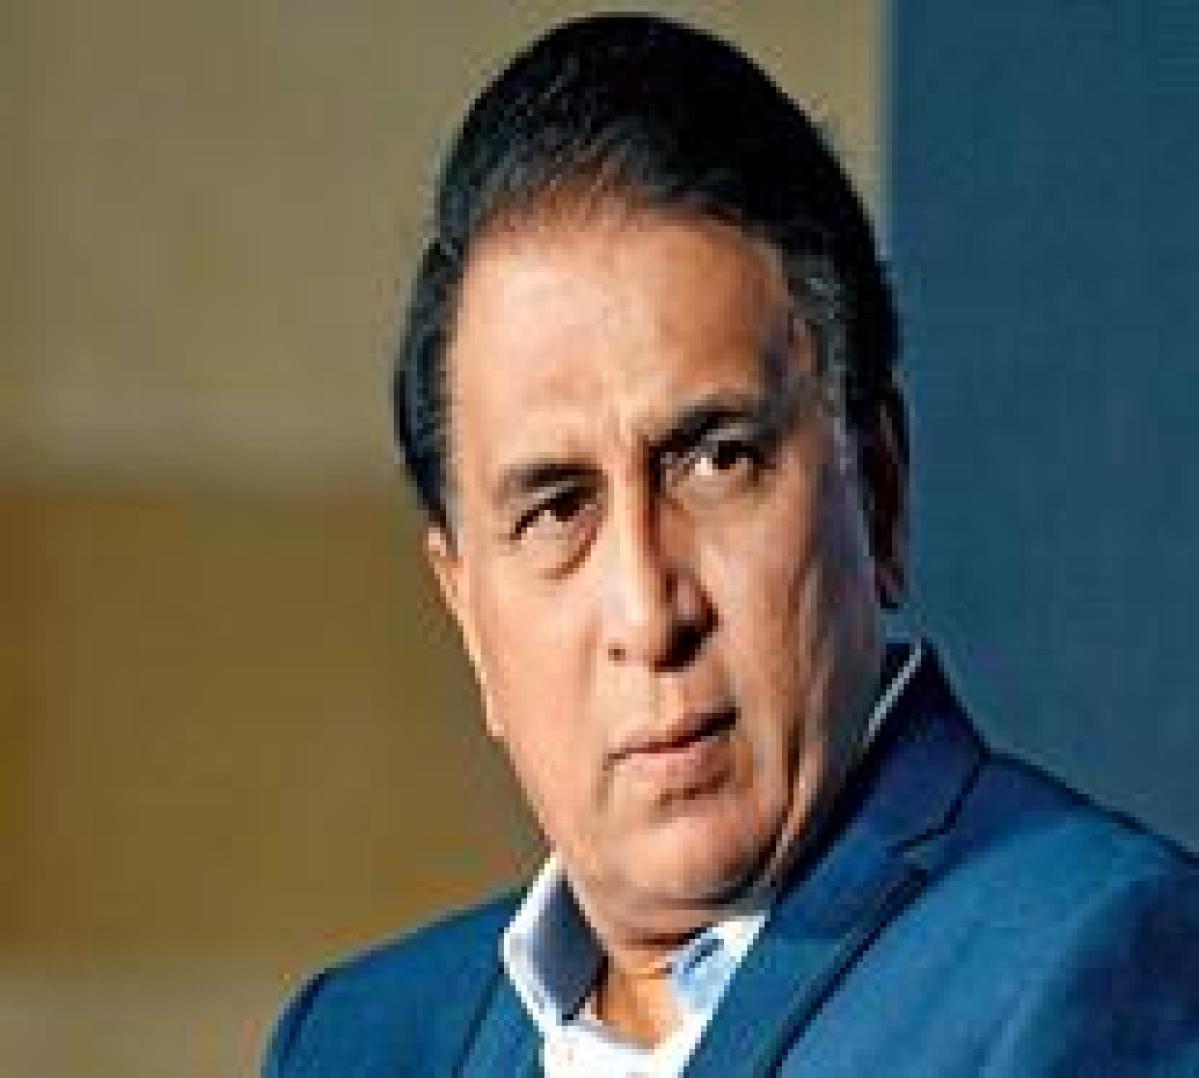 In praising Sunil Gavaskar, Virendra Sehwag switches to top gear